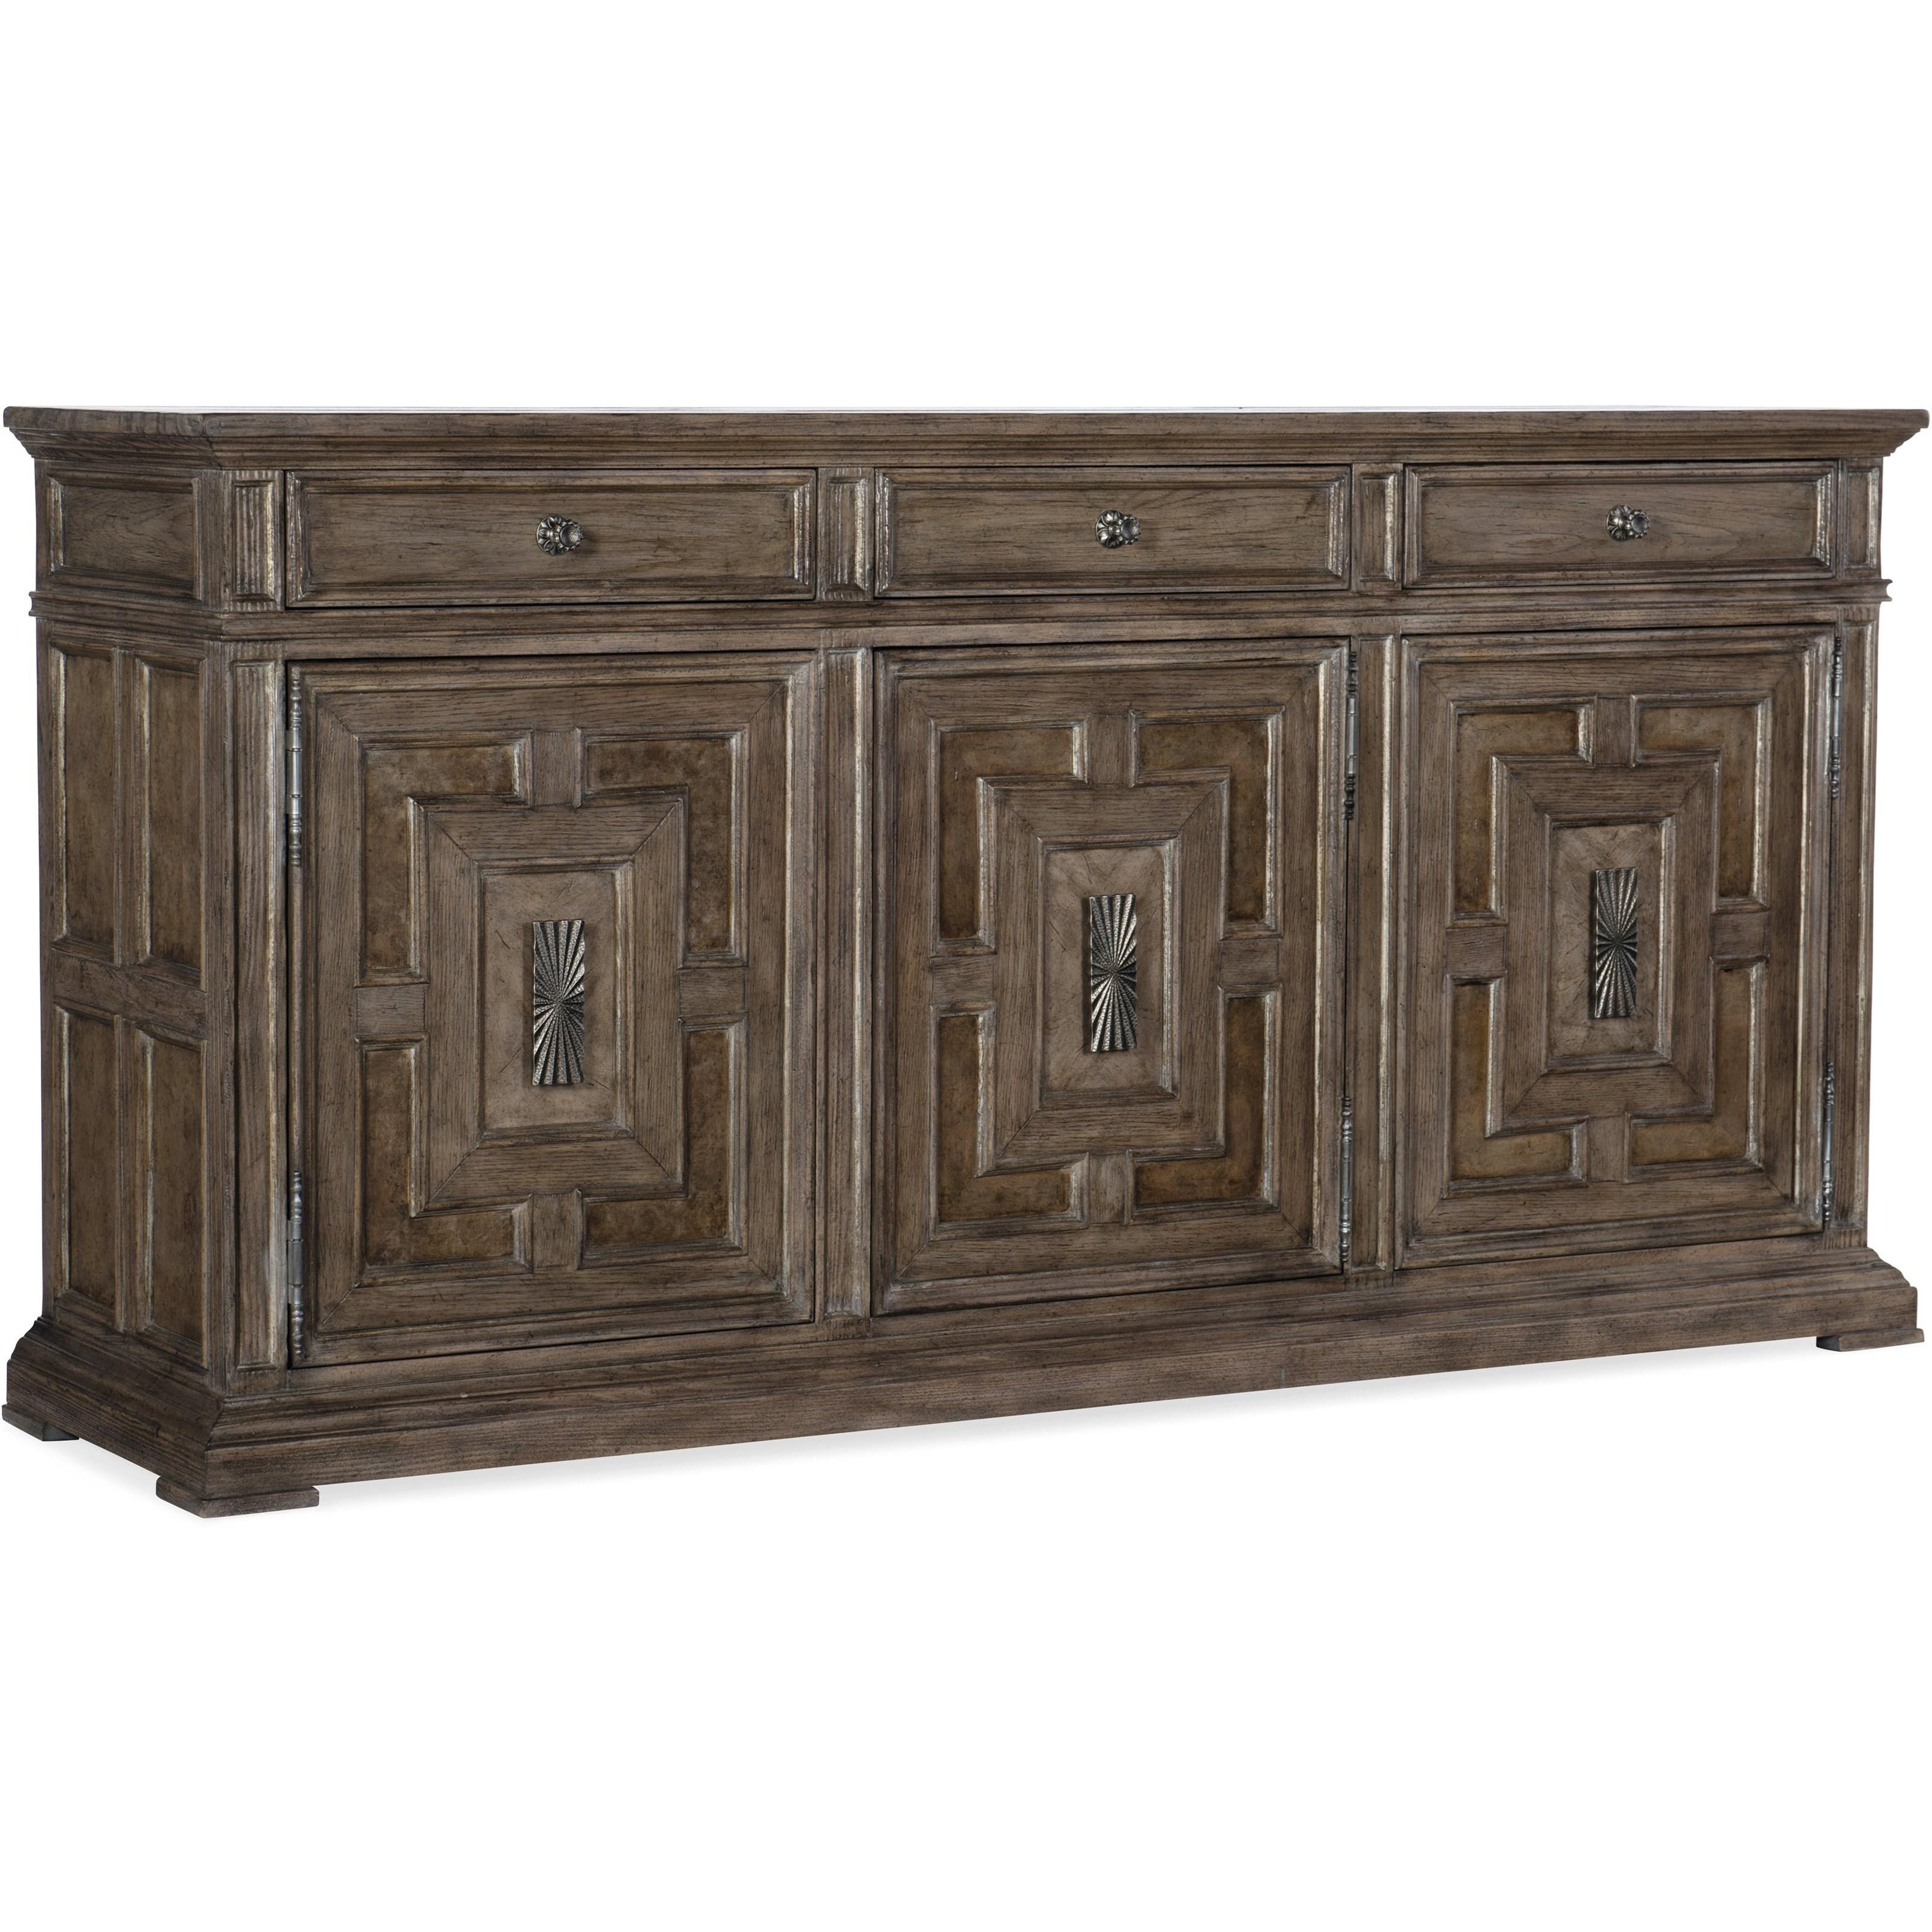 Woodlands Buffet by Hooker Furniture at Baer's Furniture